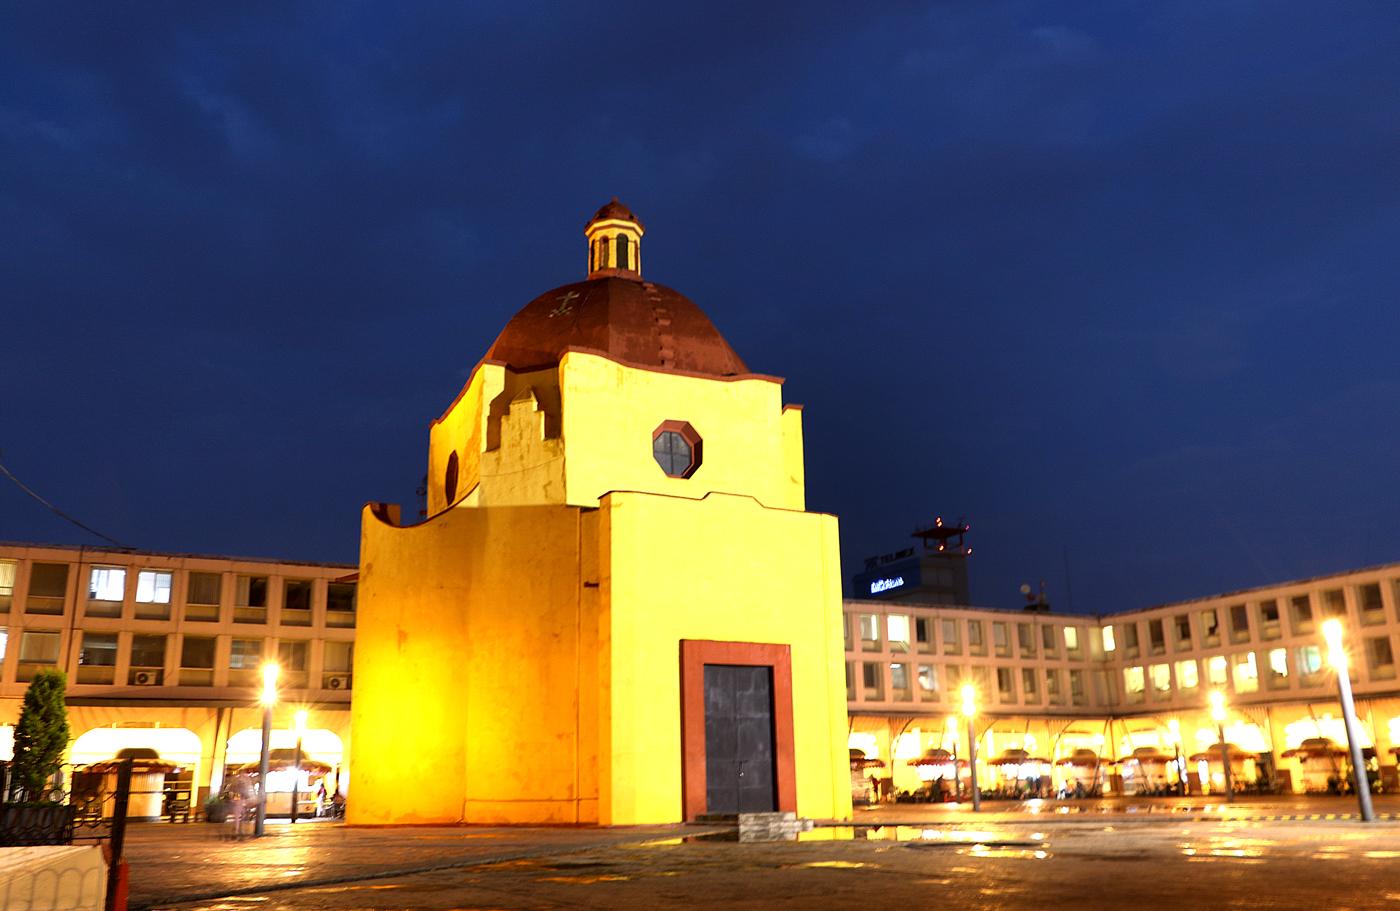 Miércoles de Cine en la Capilla Exenta de Toluca